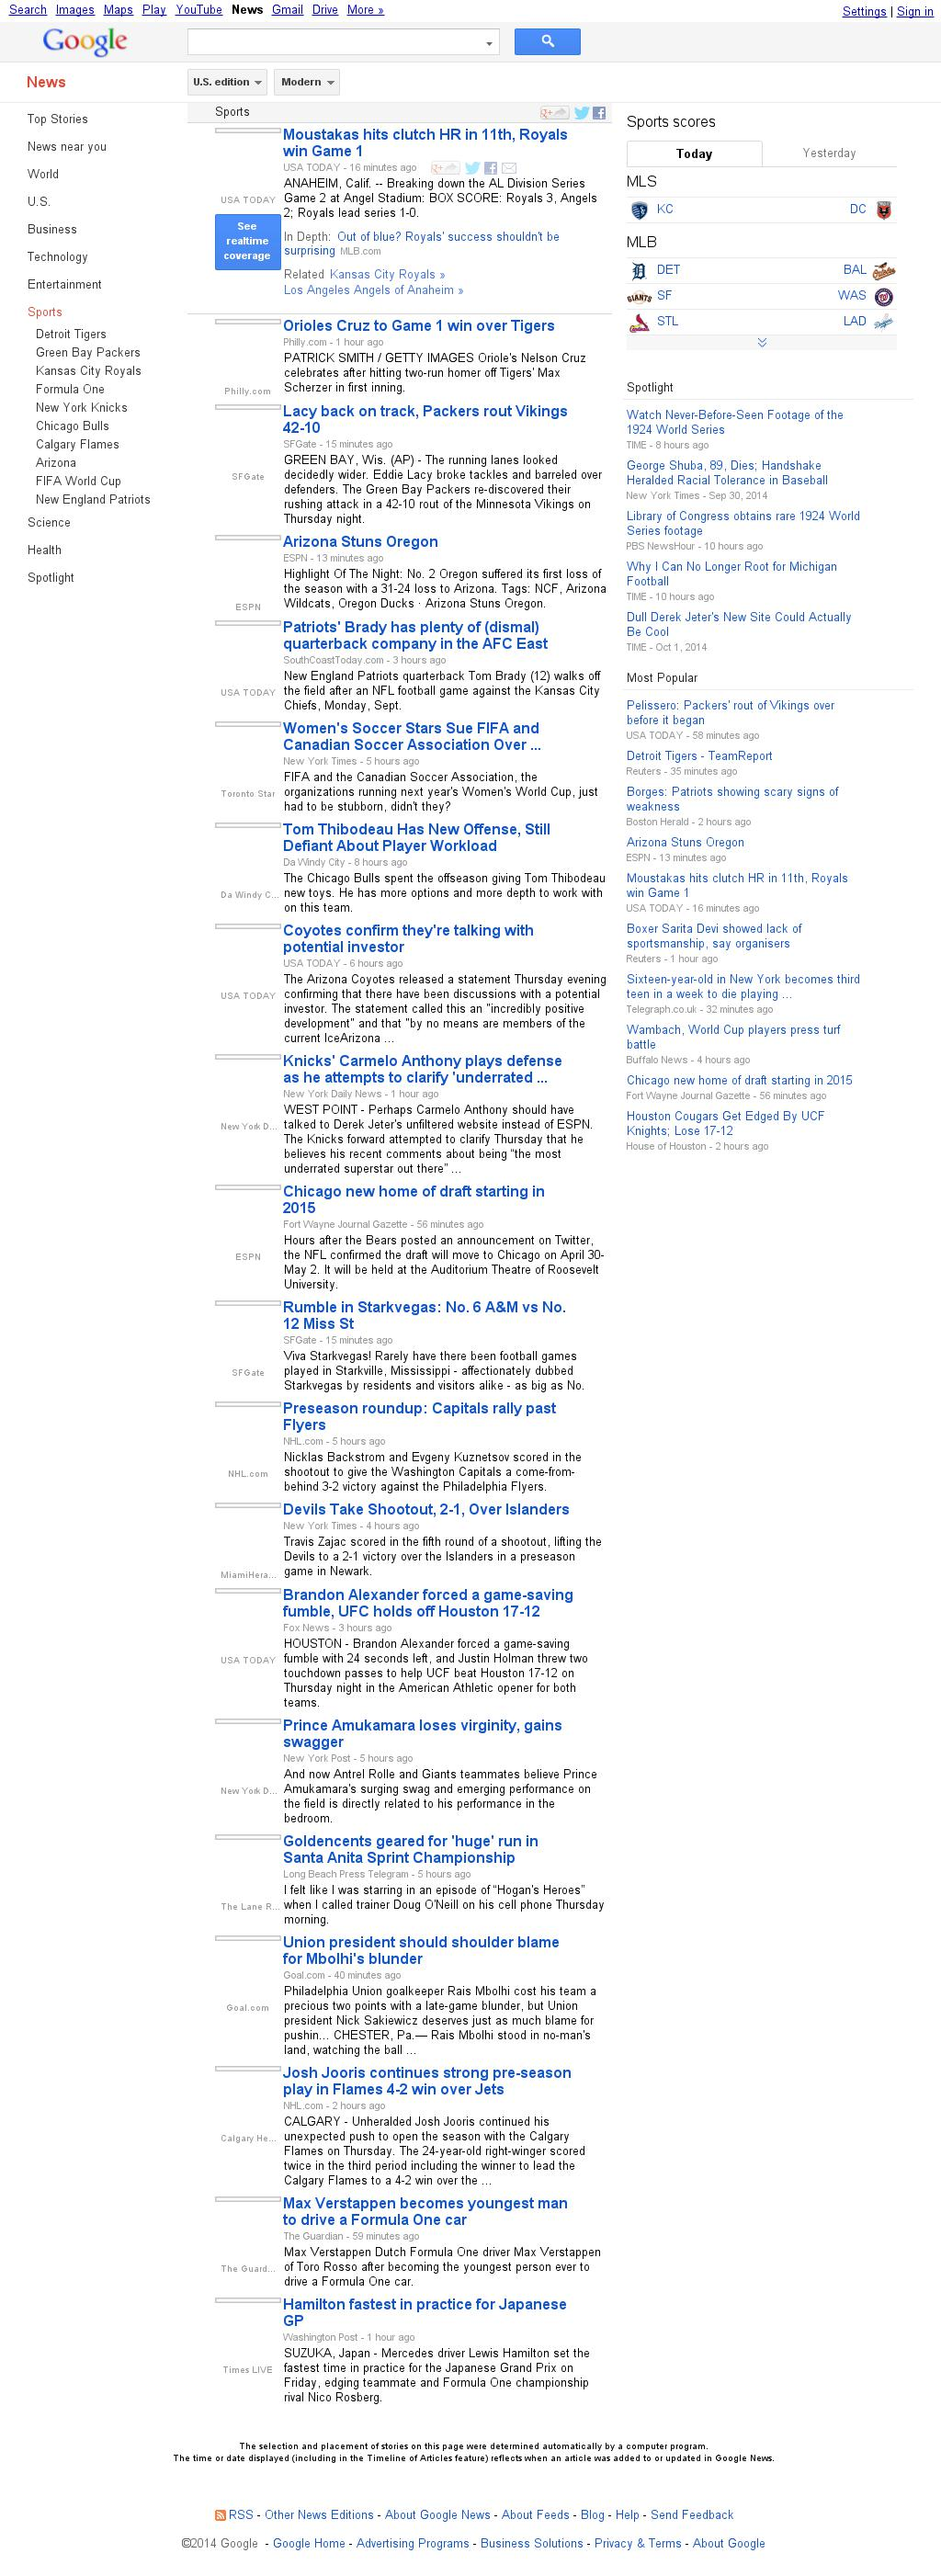 Google News: Sports at Friday Oct. 3, 2014, 8:05 a.m. UTC